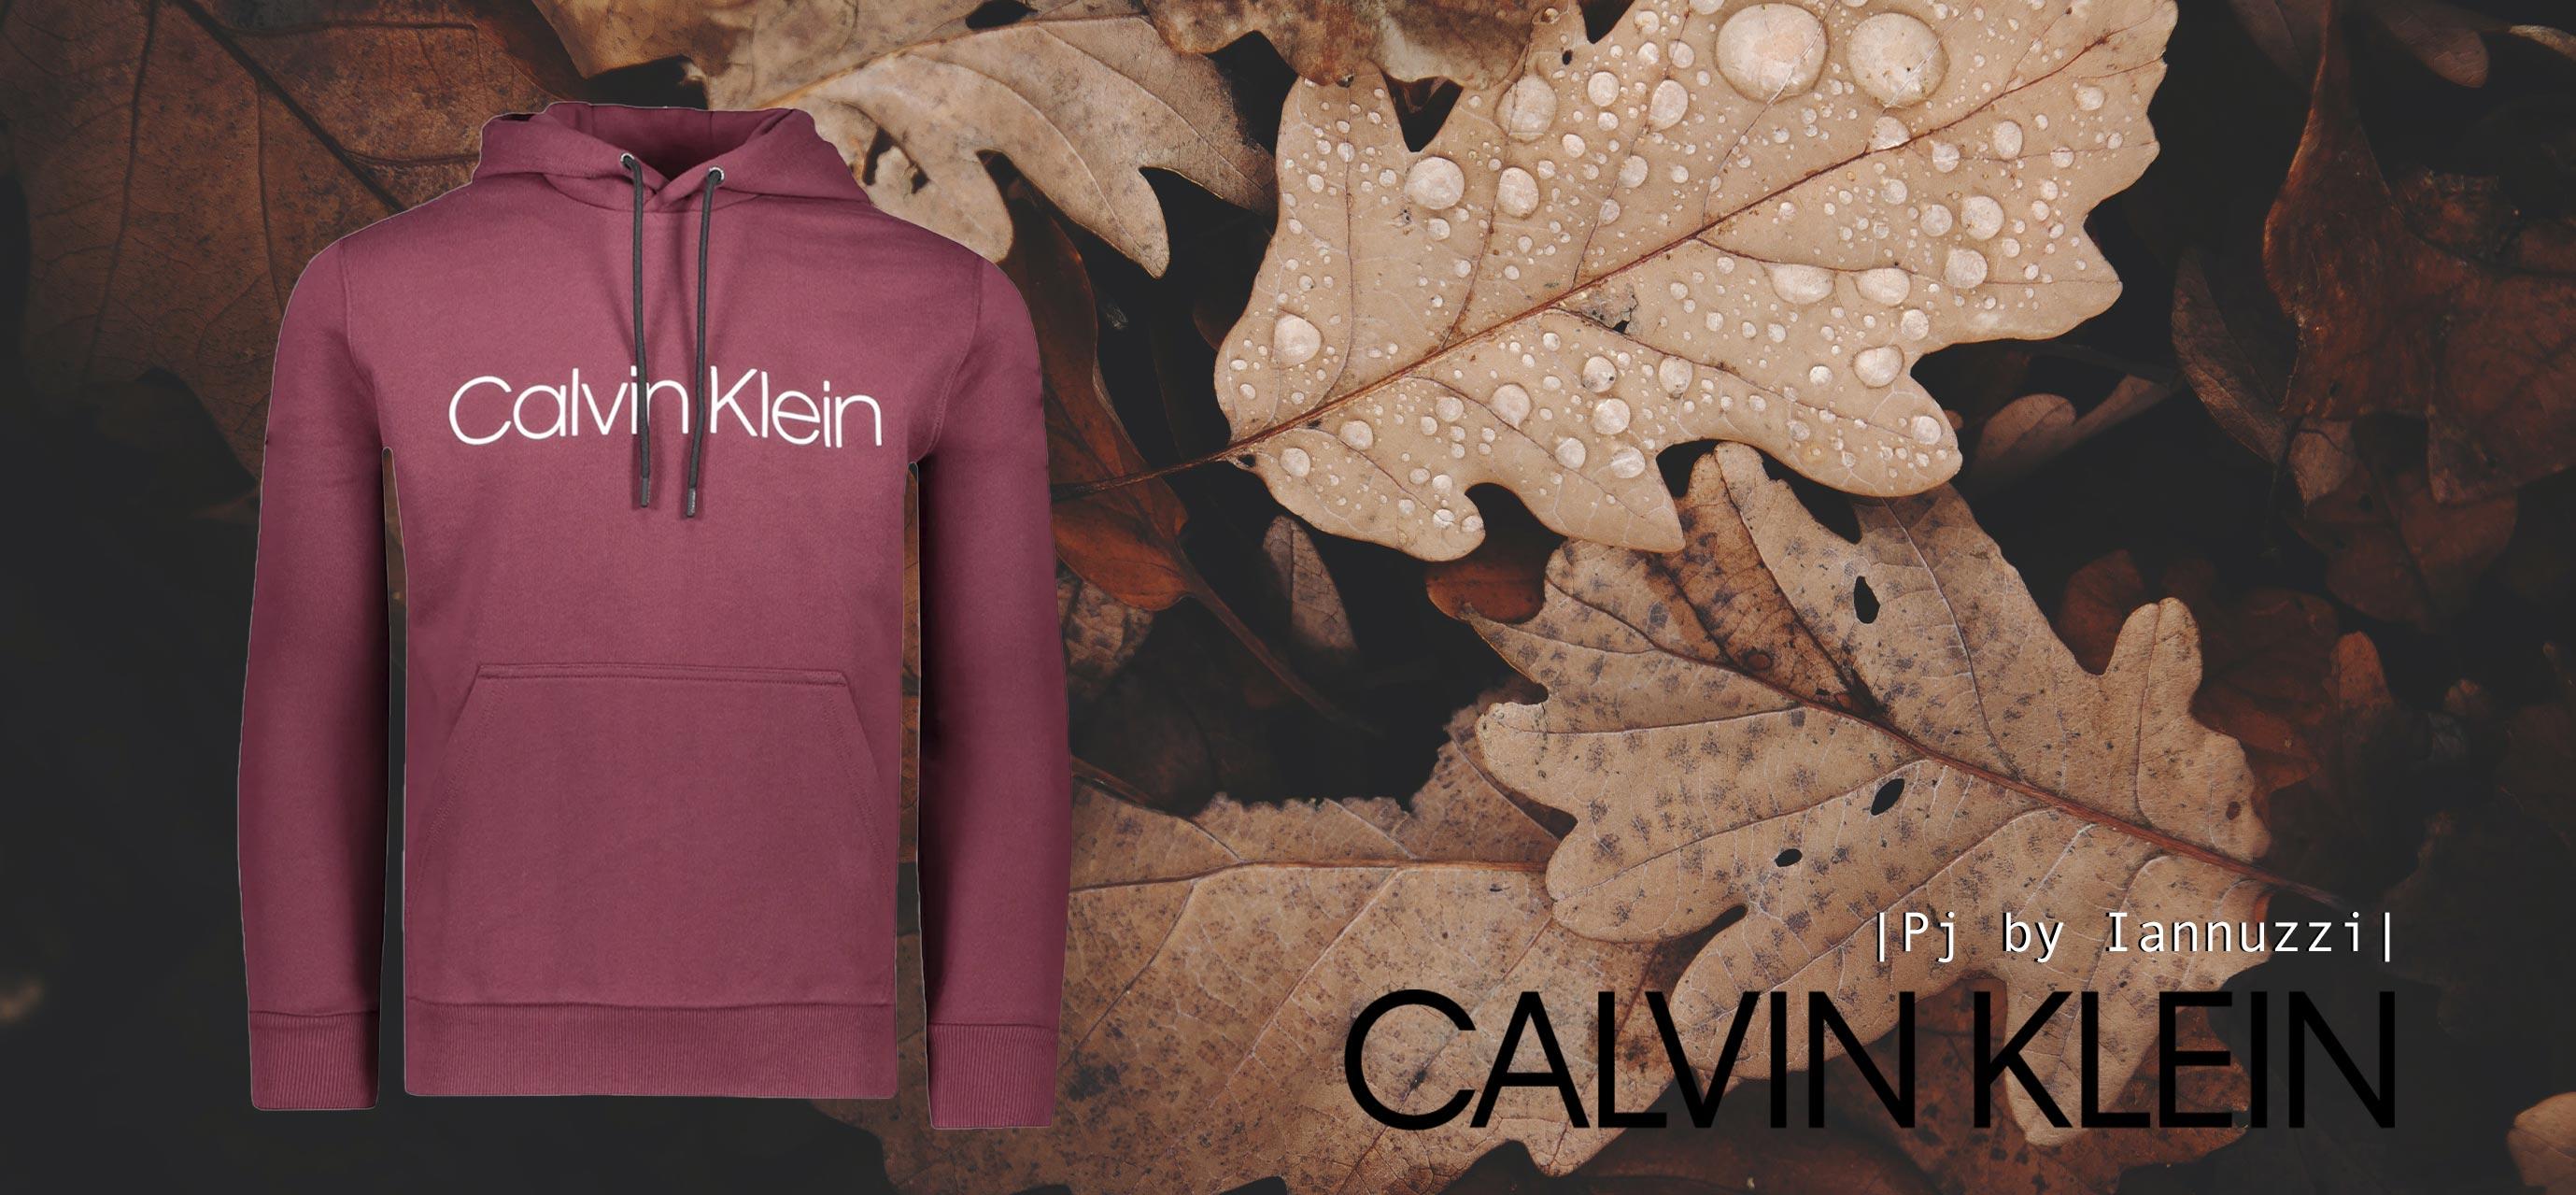 Scopri Calvin Klein